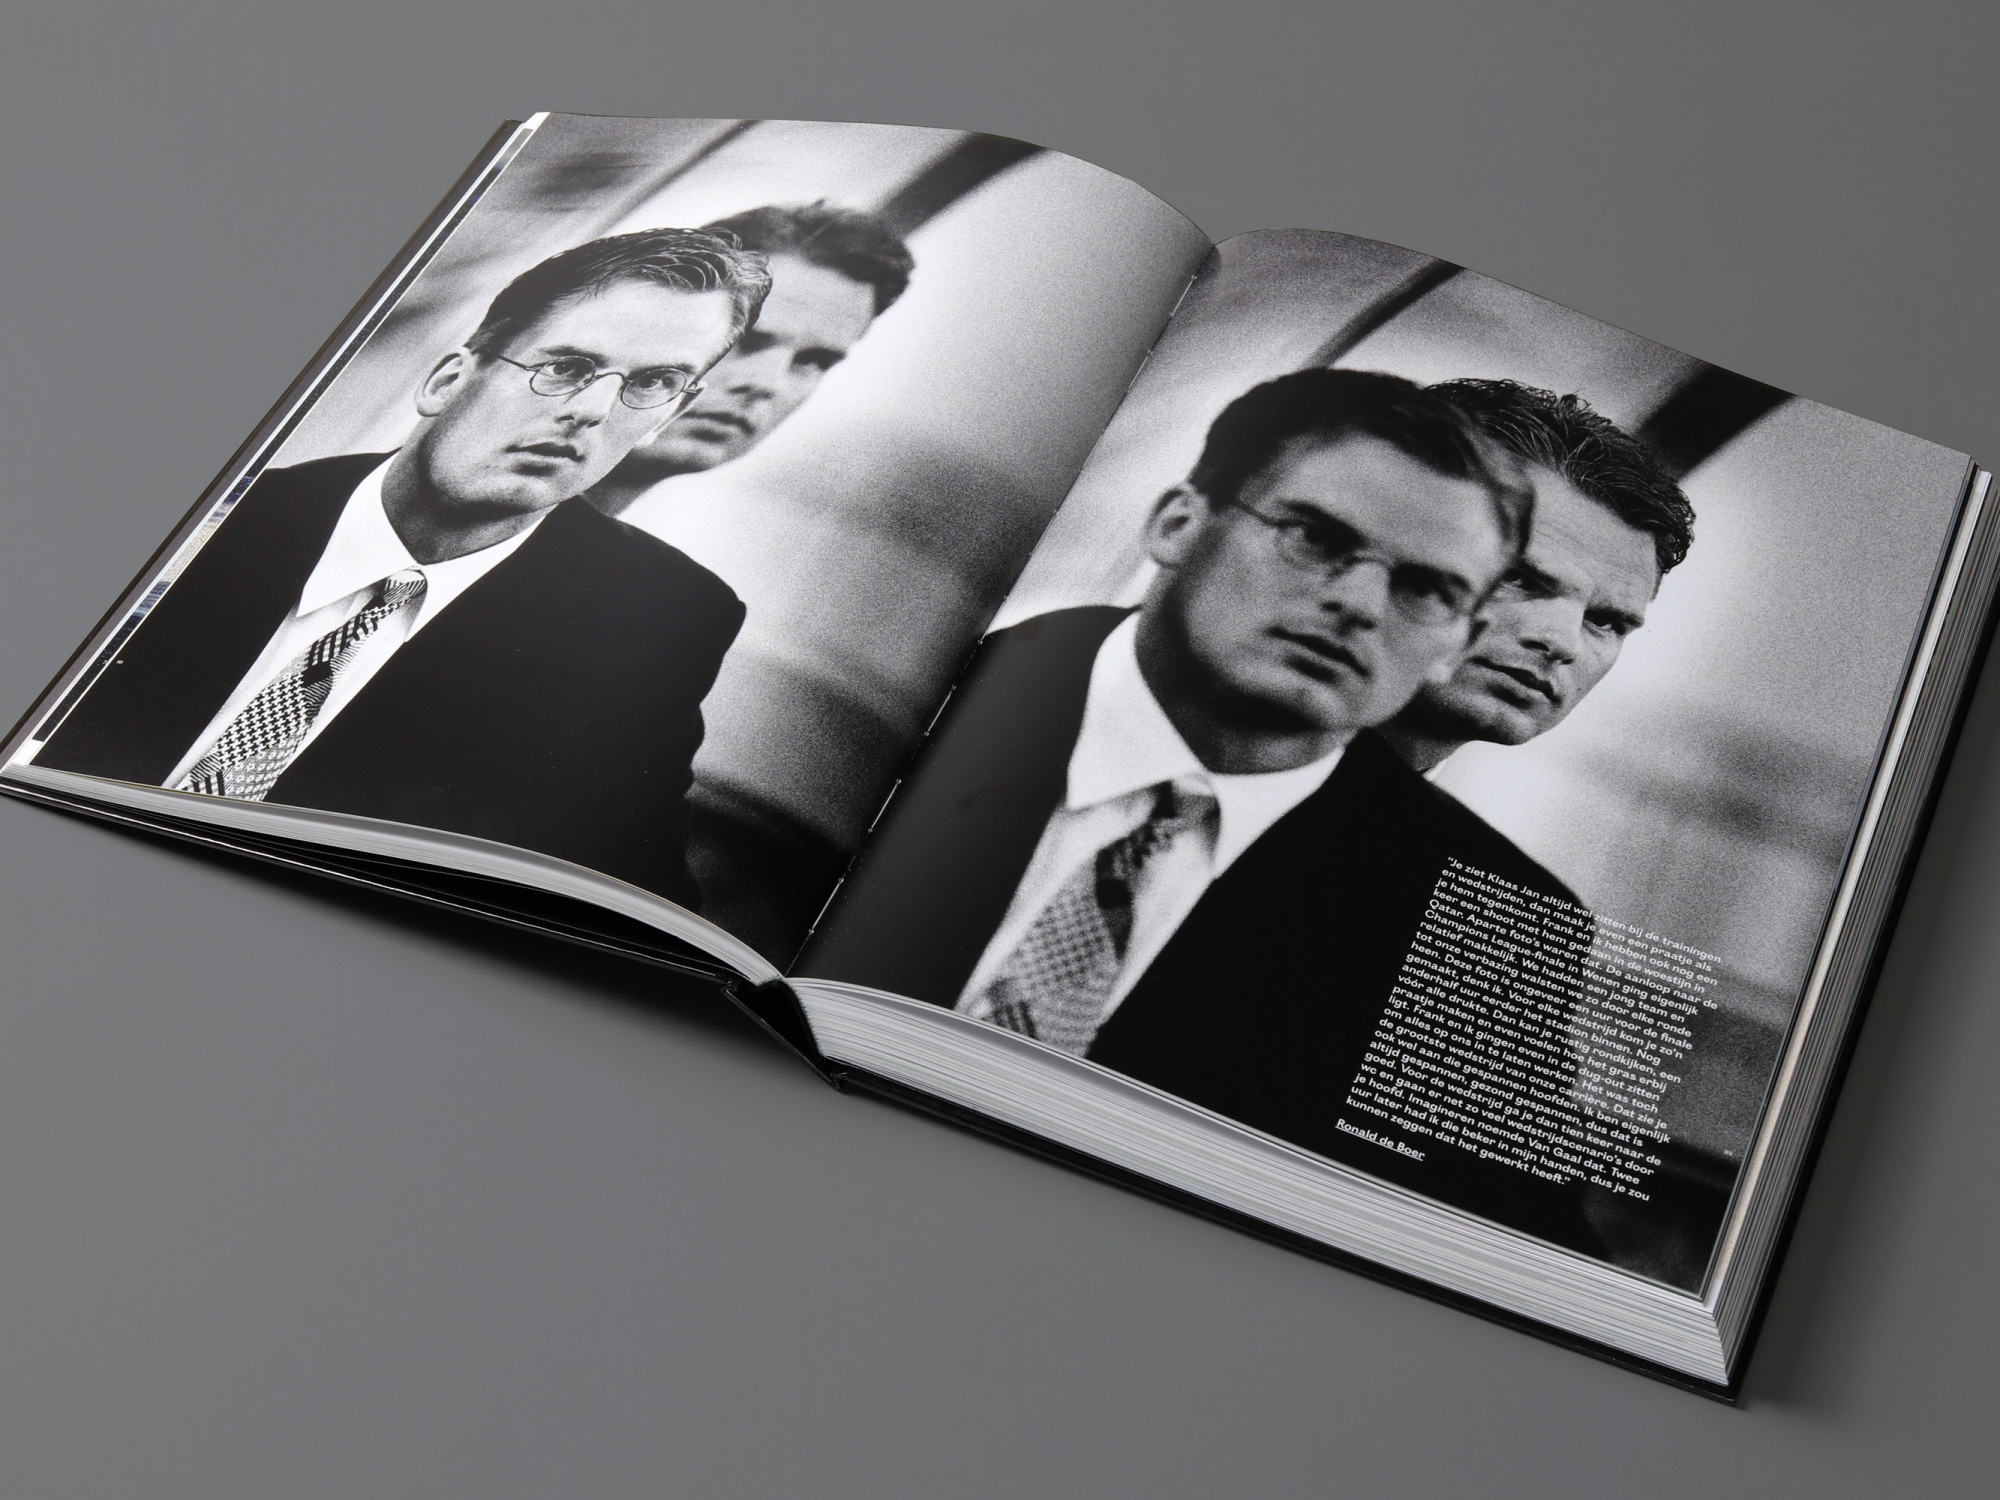 mendo-books-Sportret-studio-01-5-van-18-2000x1500-c-default.jpg